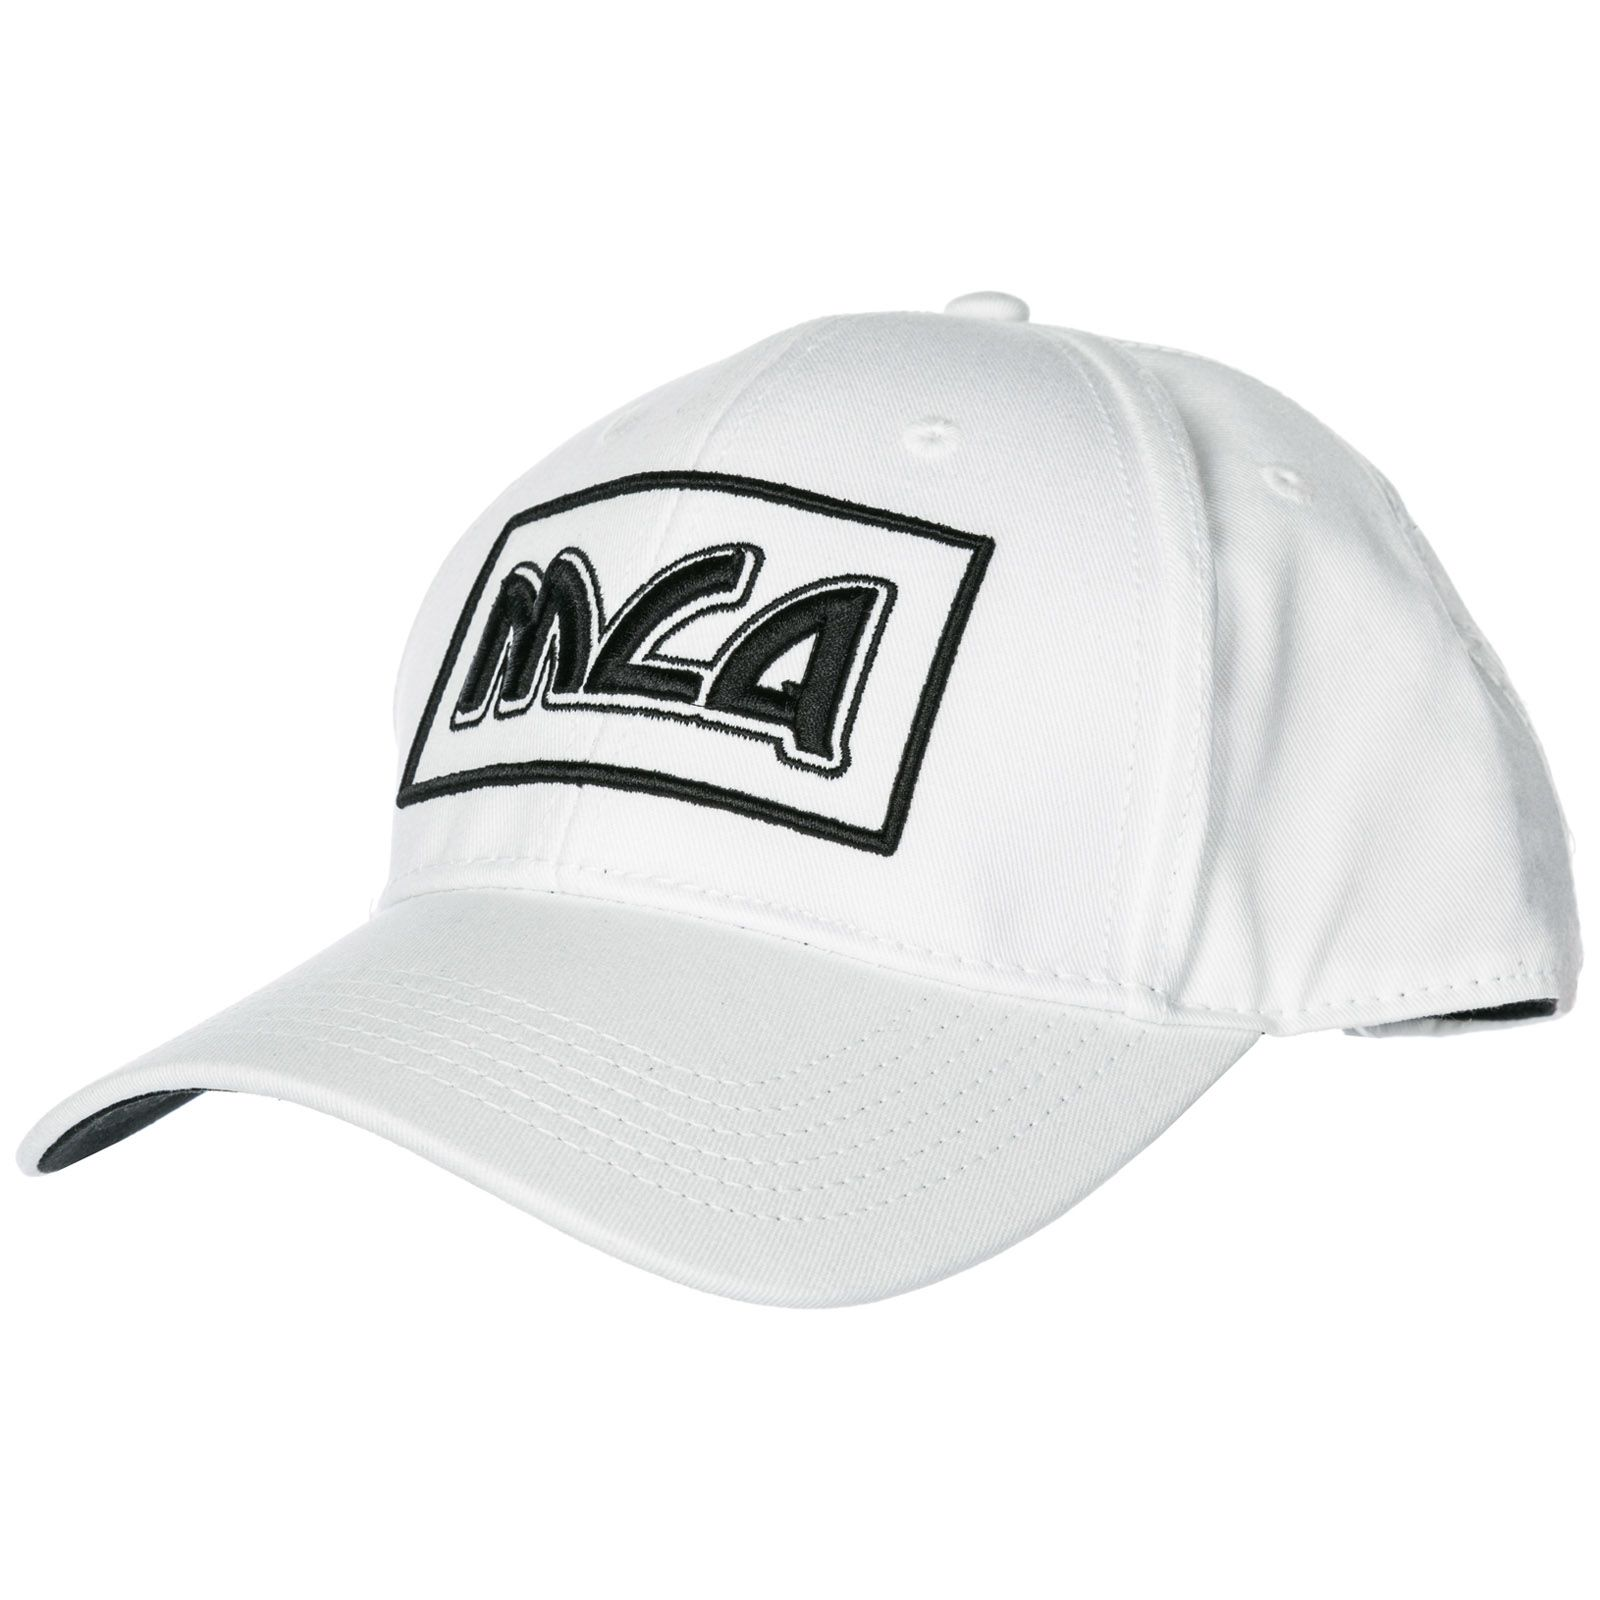 d8b218c5d7317 McQ Alexander McQueen Adjustable Cotton Hat Baseball Cap Metal Logo - White  ...